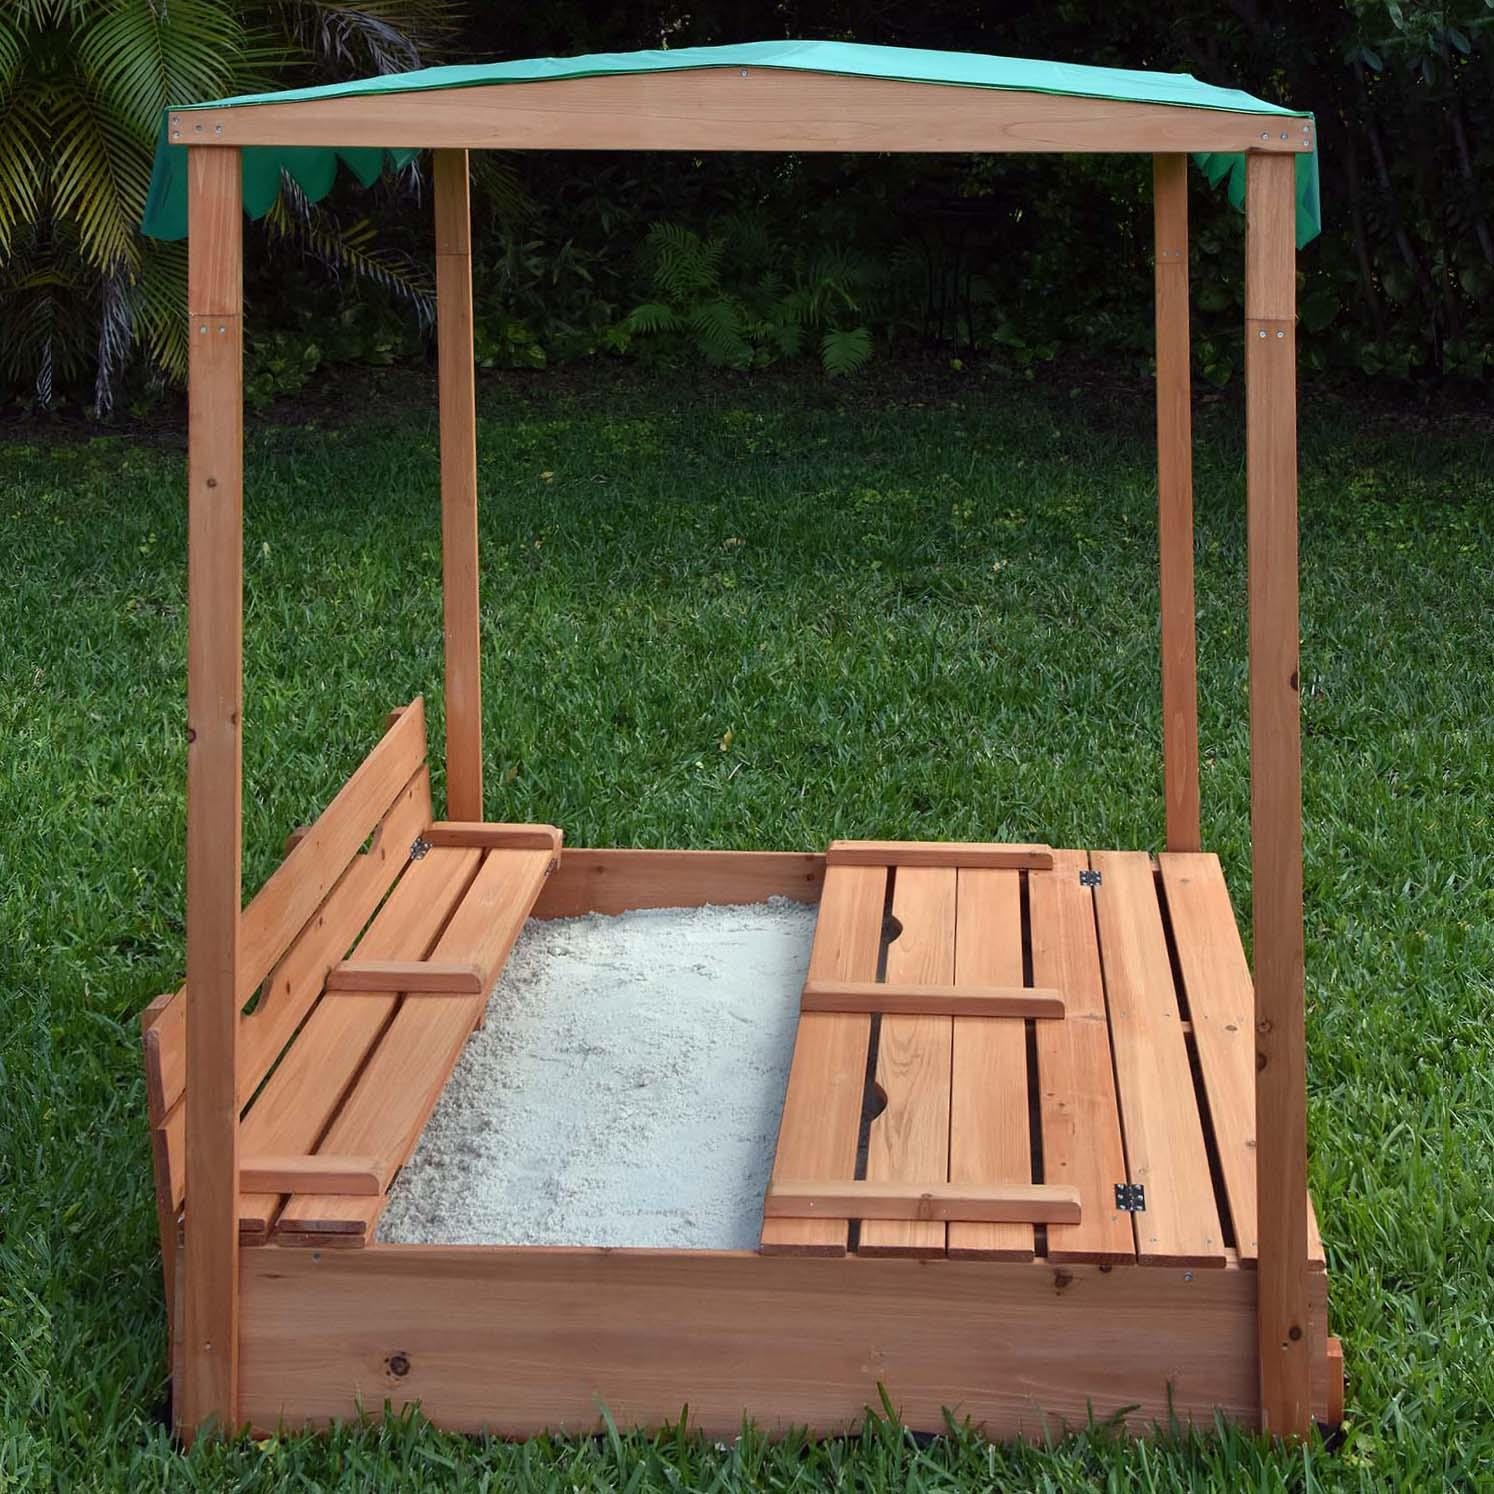 Naomi Home Kids Canopy Cedar Sandbox with Benches by Naomi Home (Image #4)